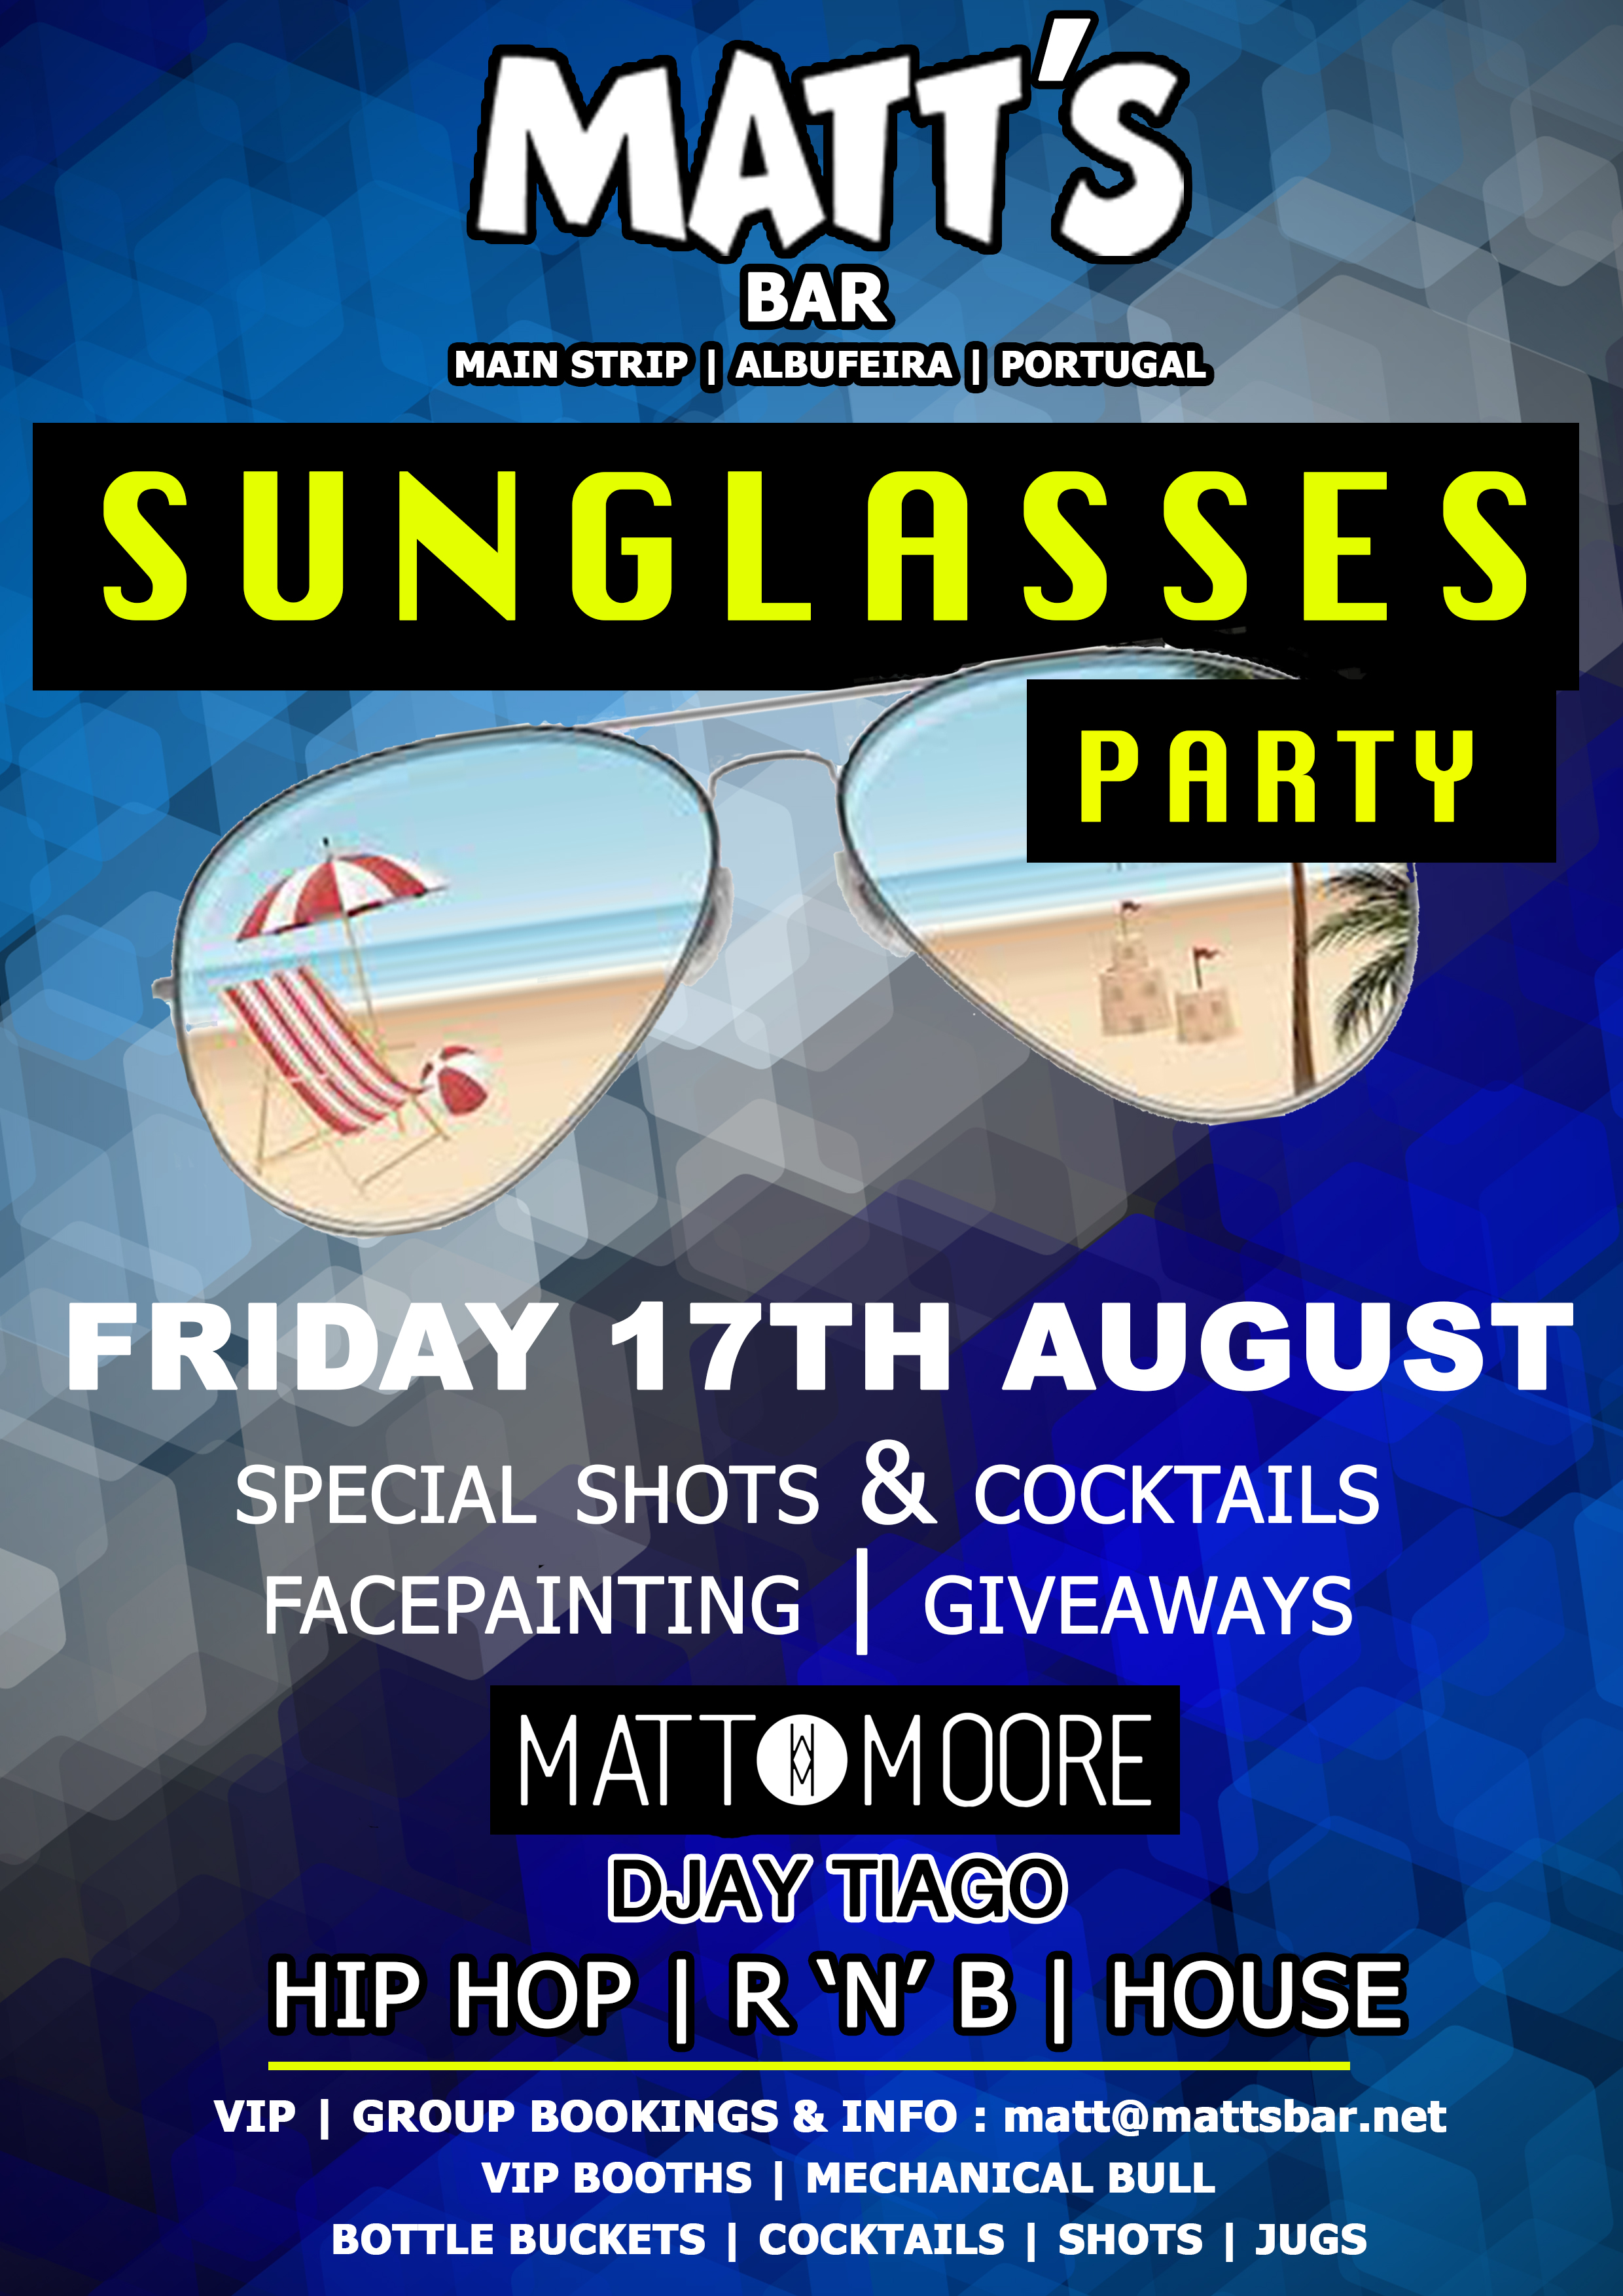 MATT'S BAR – THE SUNGLASSES PARTY